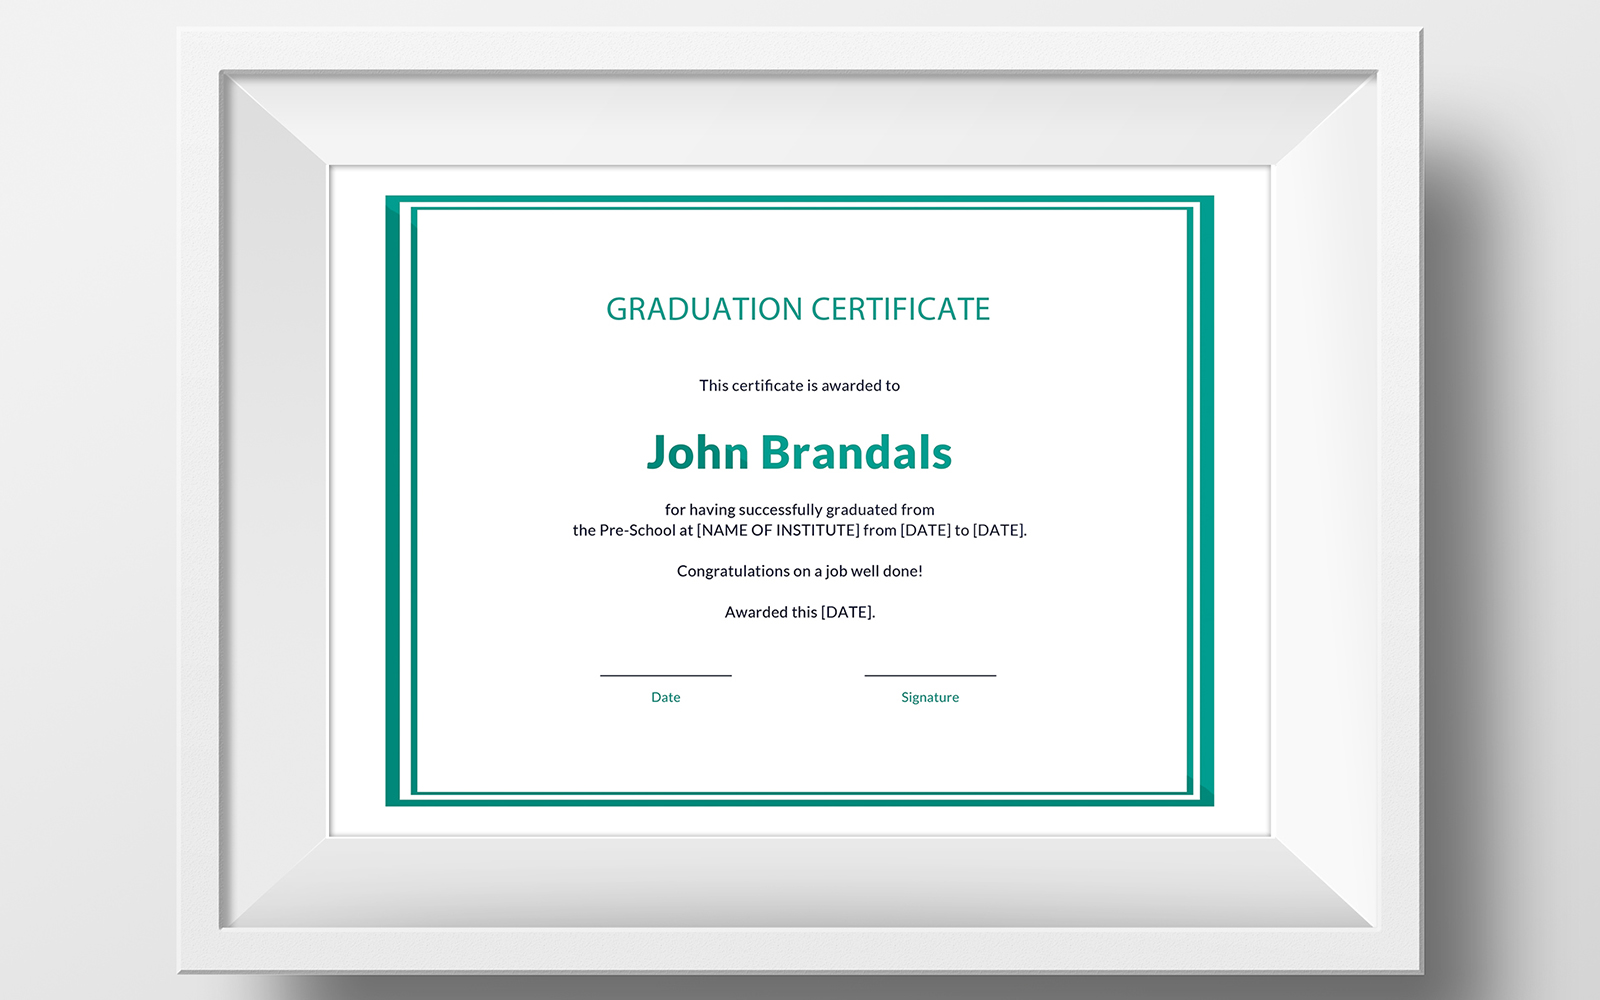 """Free High School Graduation"" - Шаблон сертифікату №116141"